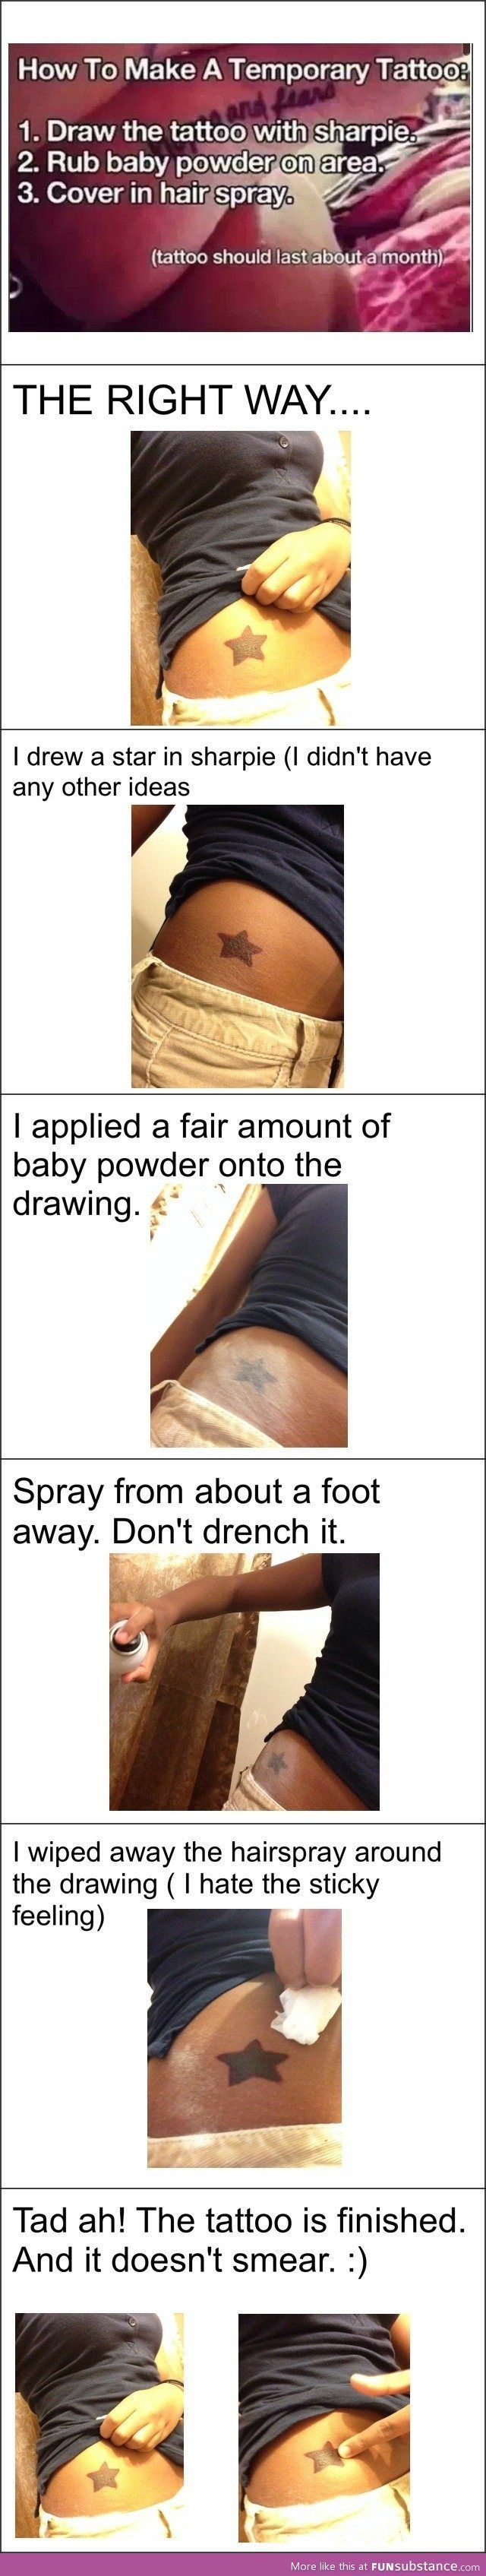 Sharpie Baby Powder And Hairspray Tattoo : sharpie, powder, hairspray, tattoo, Sabrina, Gracia, Loves, Sharpie, Tattoos,, Temporary, Tattoos